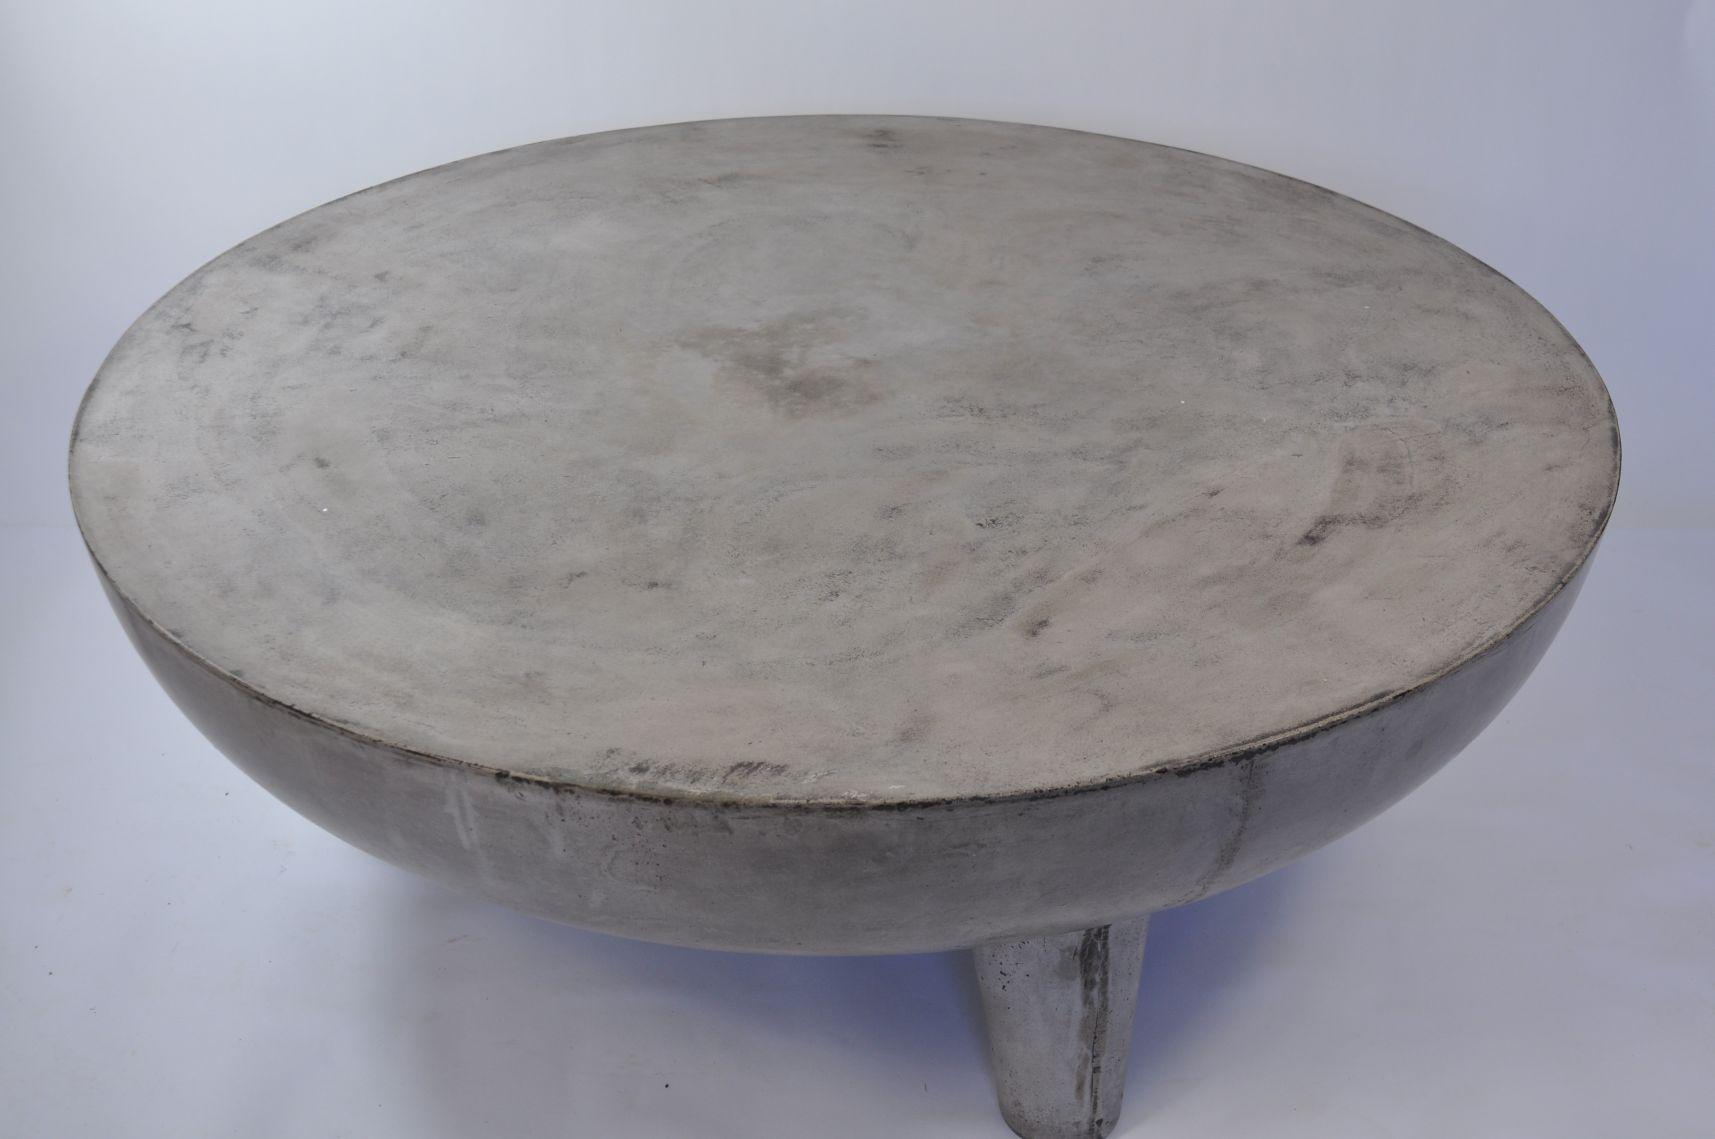 Greer Light Concrete Coffee Table Mecox Gardens [ 1139 x 1715 Pixel ]